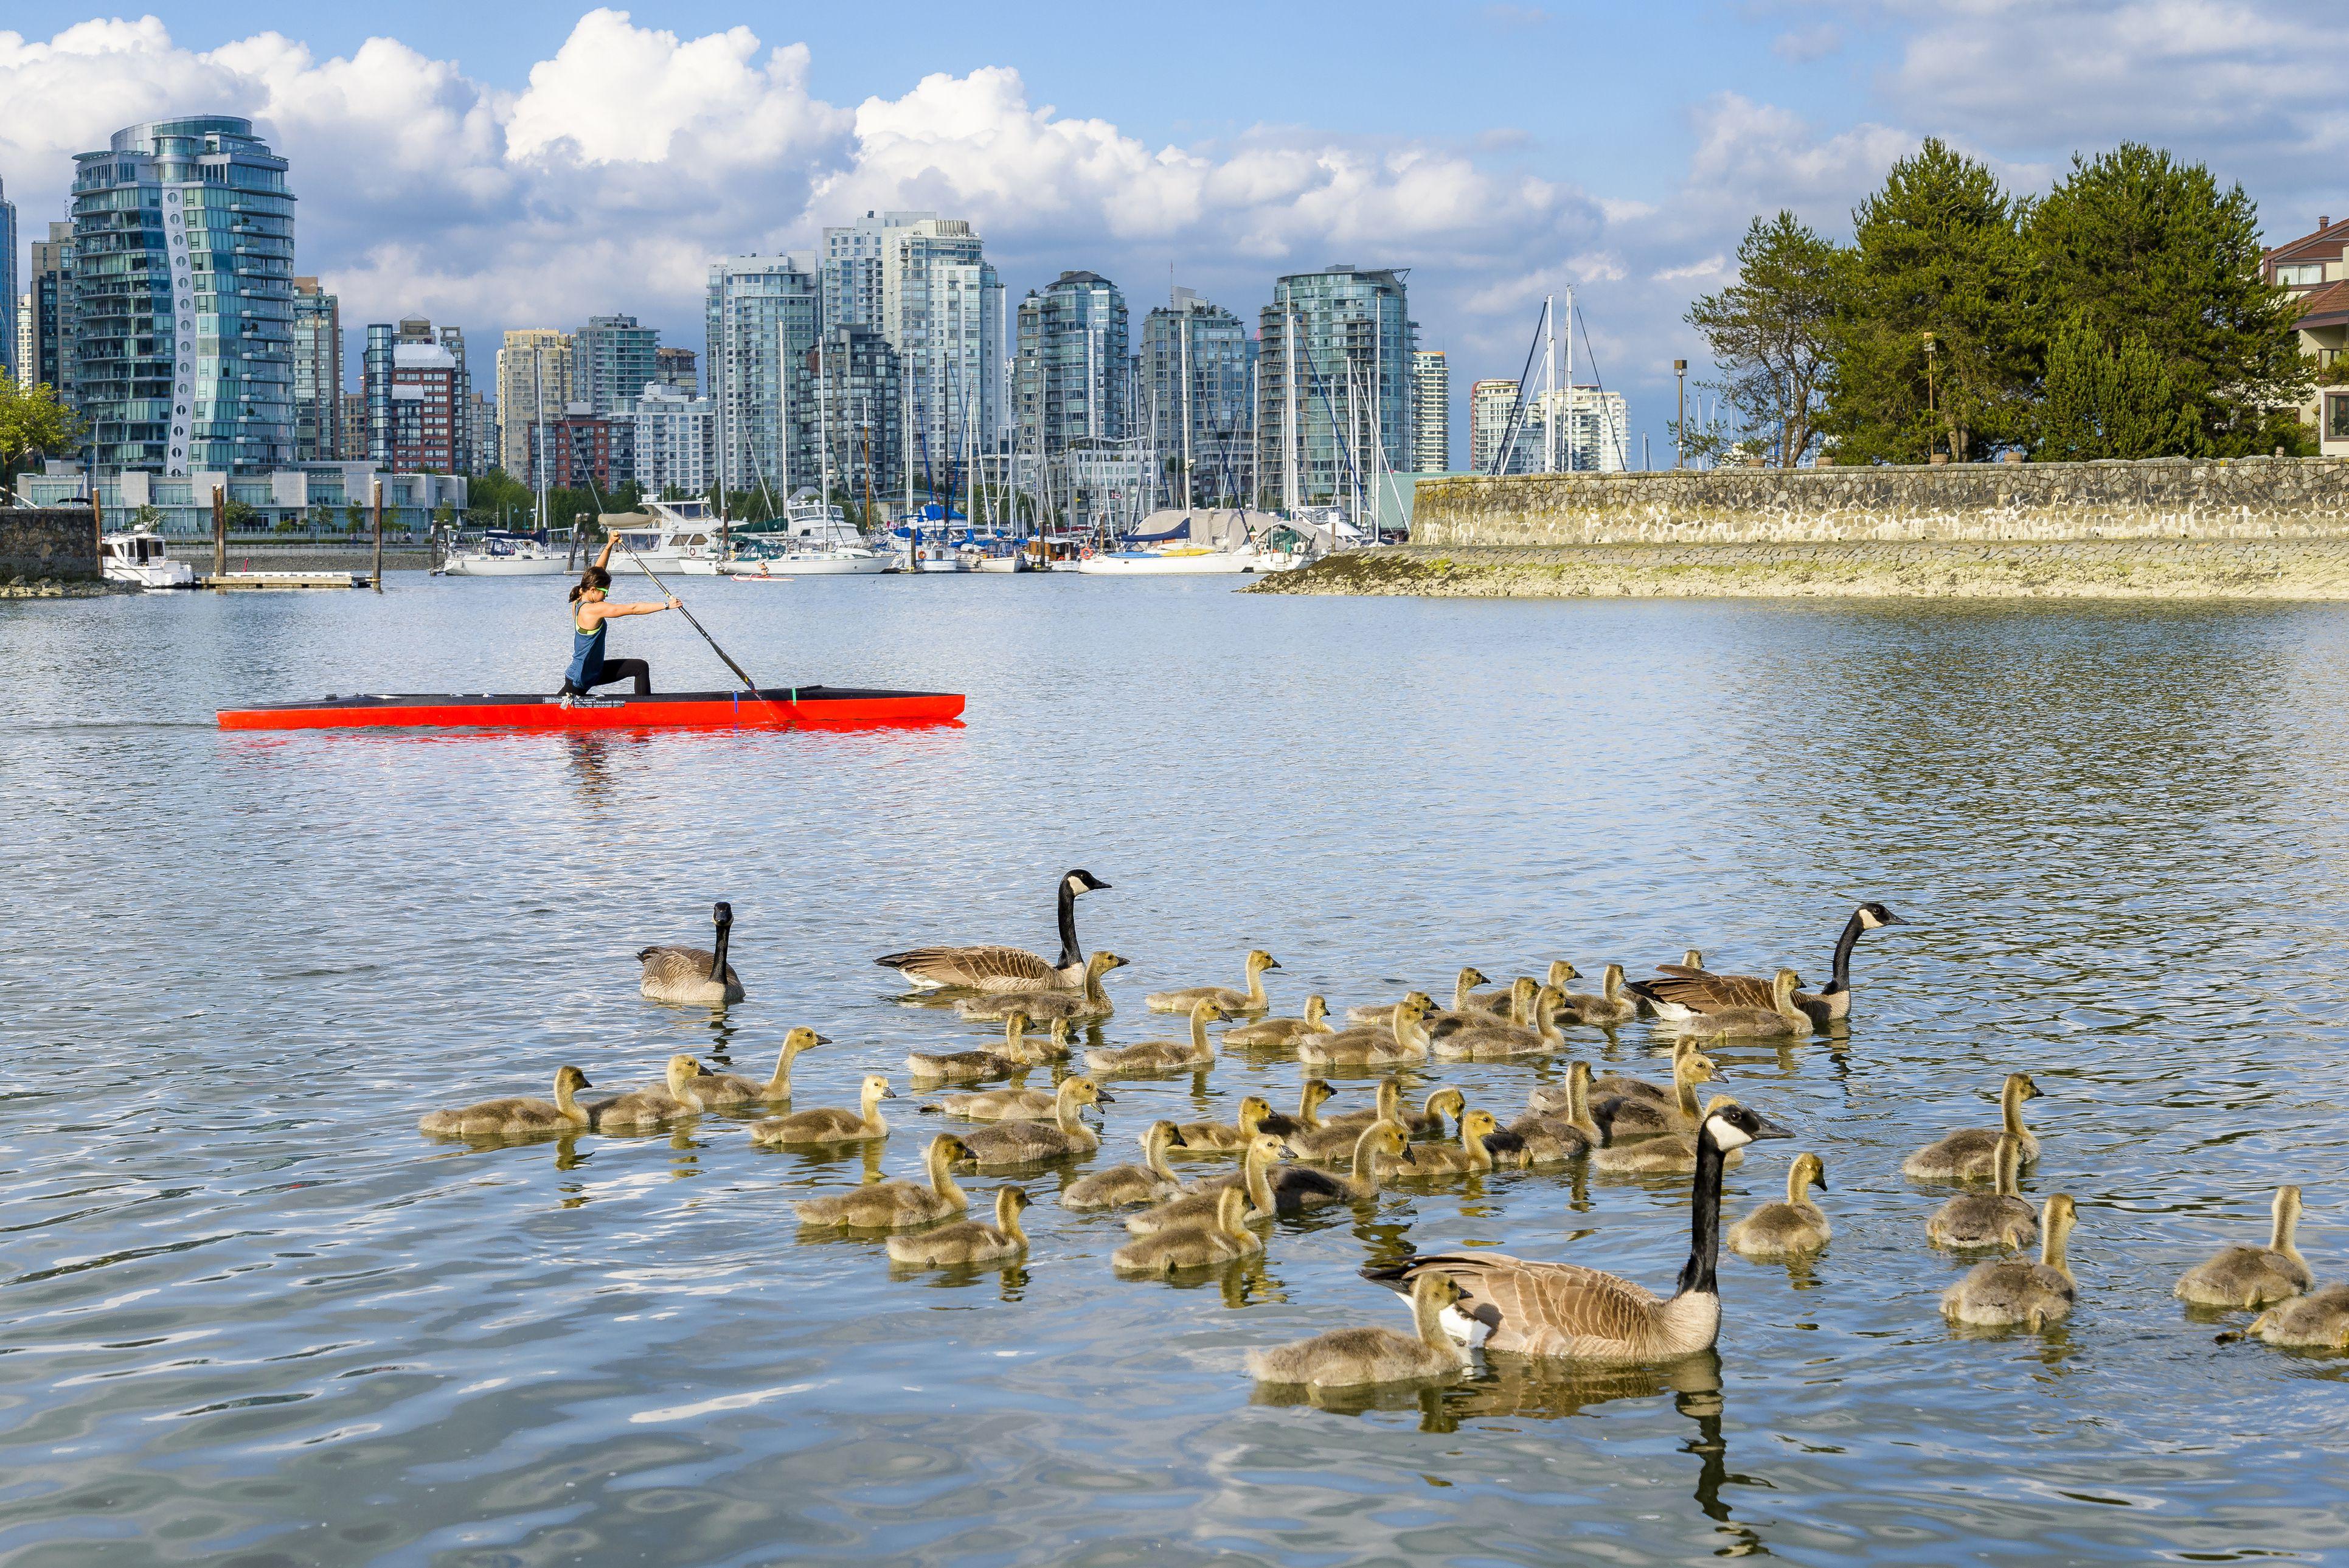 Canada Geese families at False Creek seawall, Vancouver, British Columbia, Canada